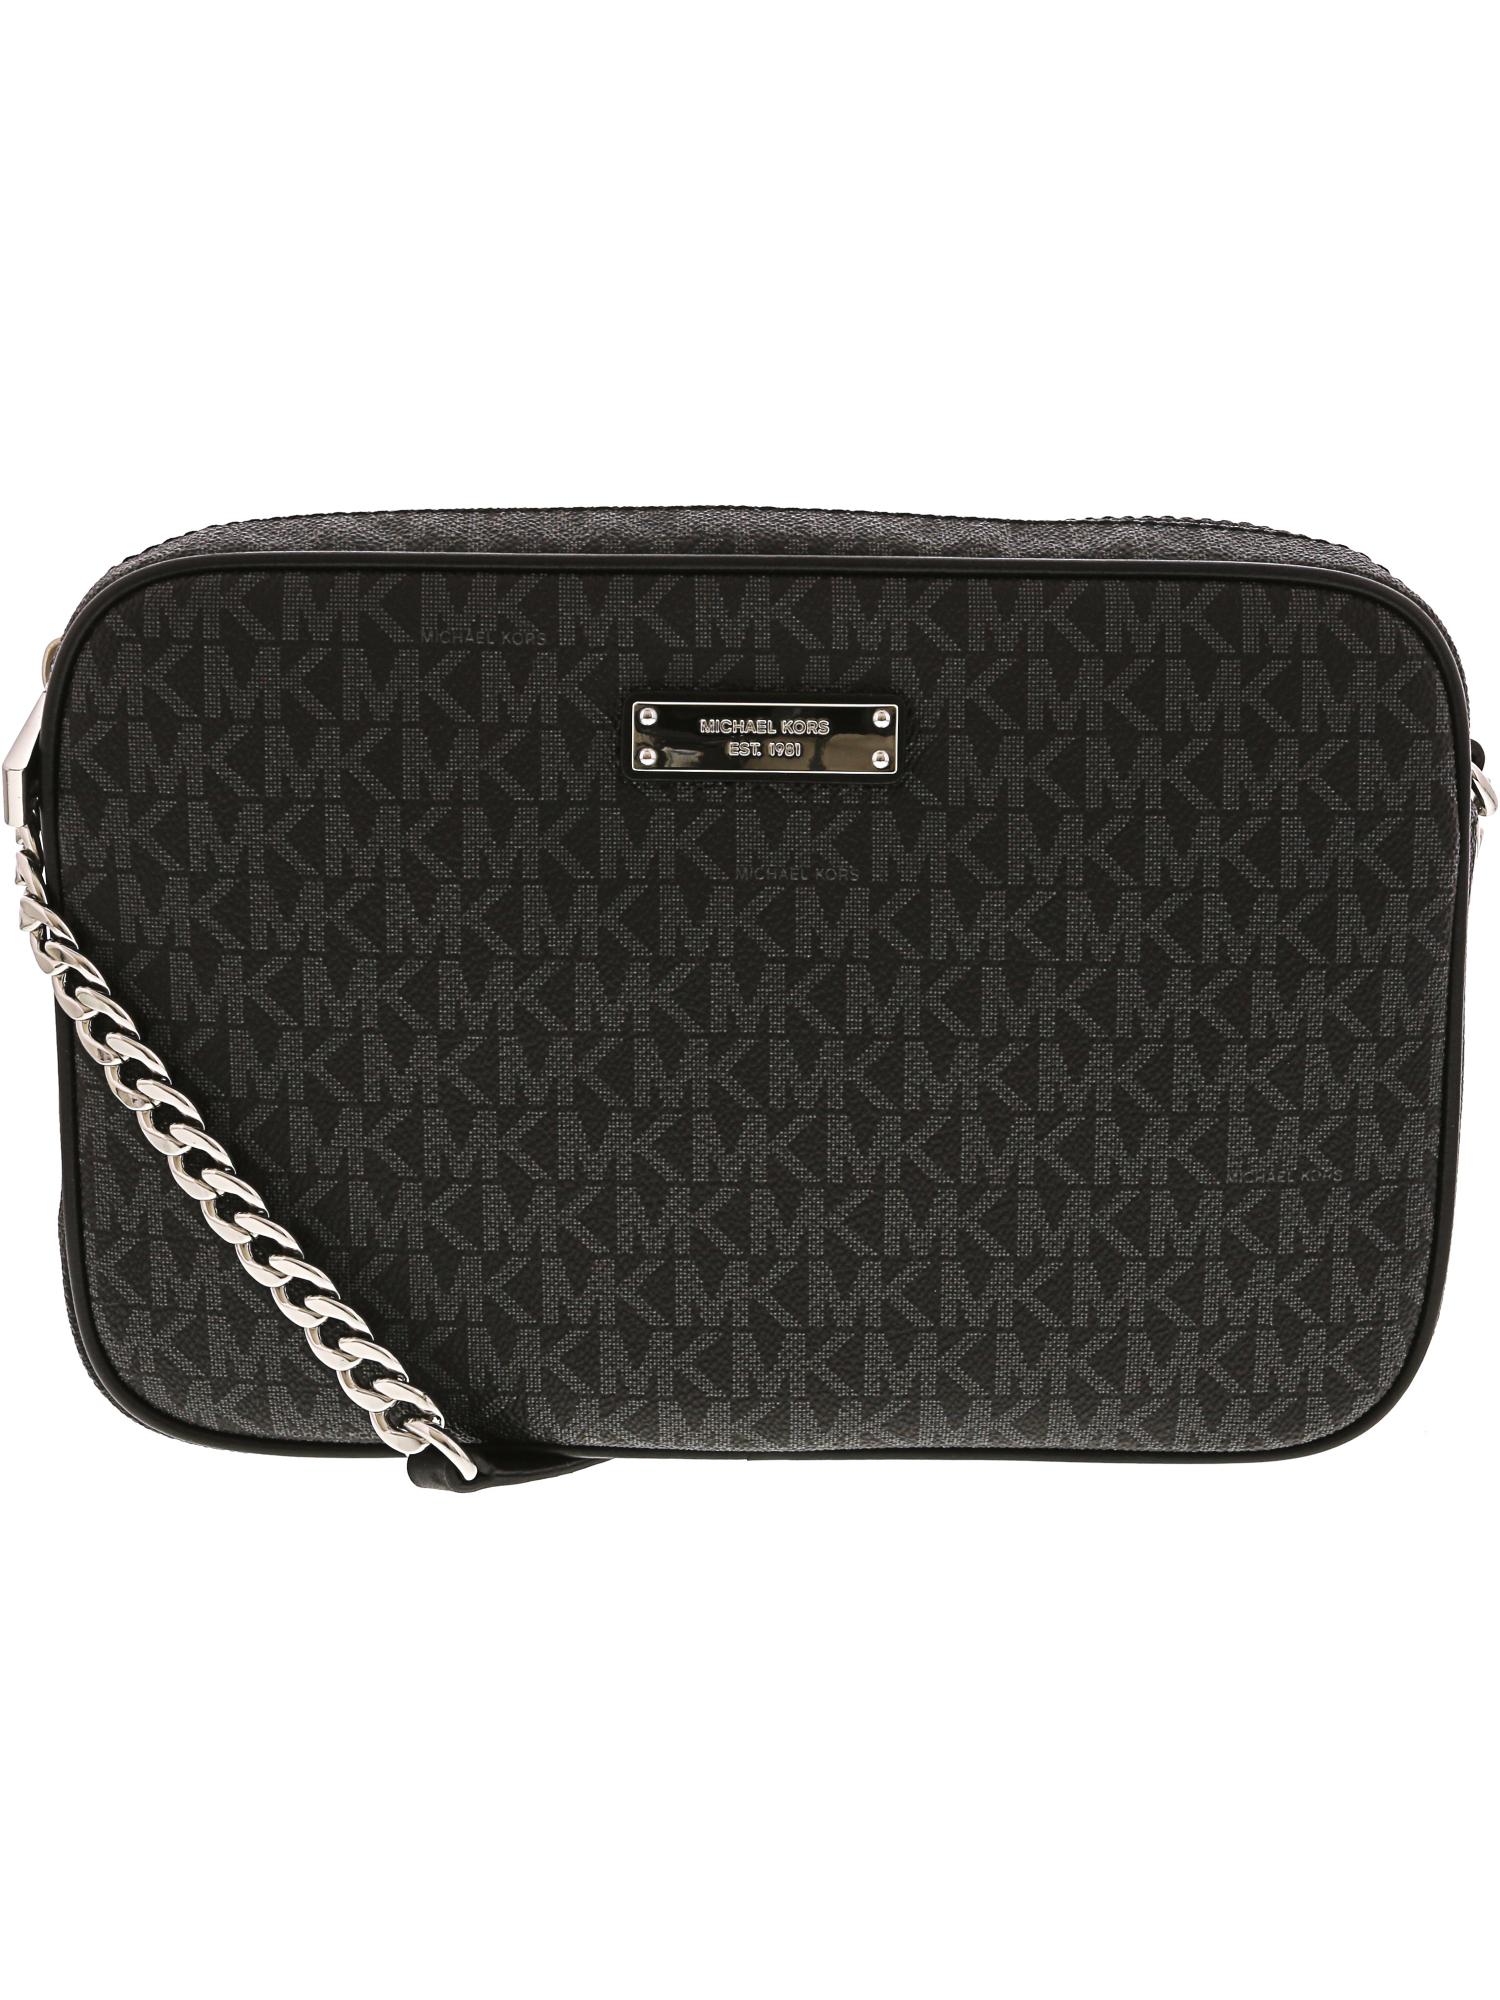 f59cee6286ab Michael Kors Women s Large Jet Set Logo Leather Crossbody Bag